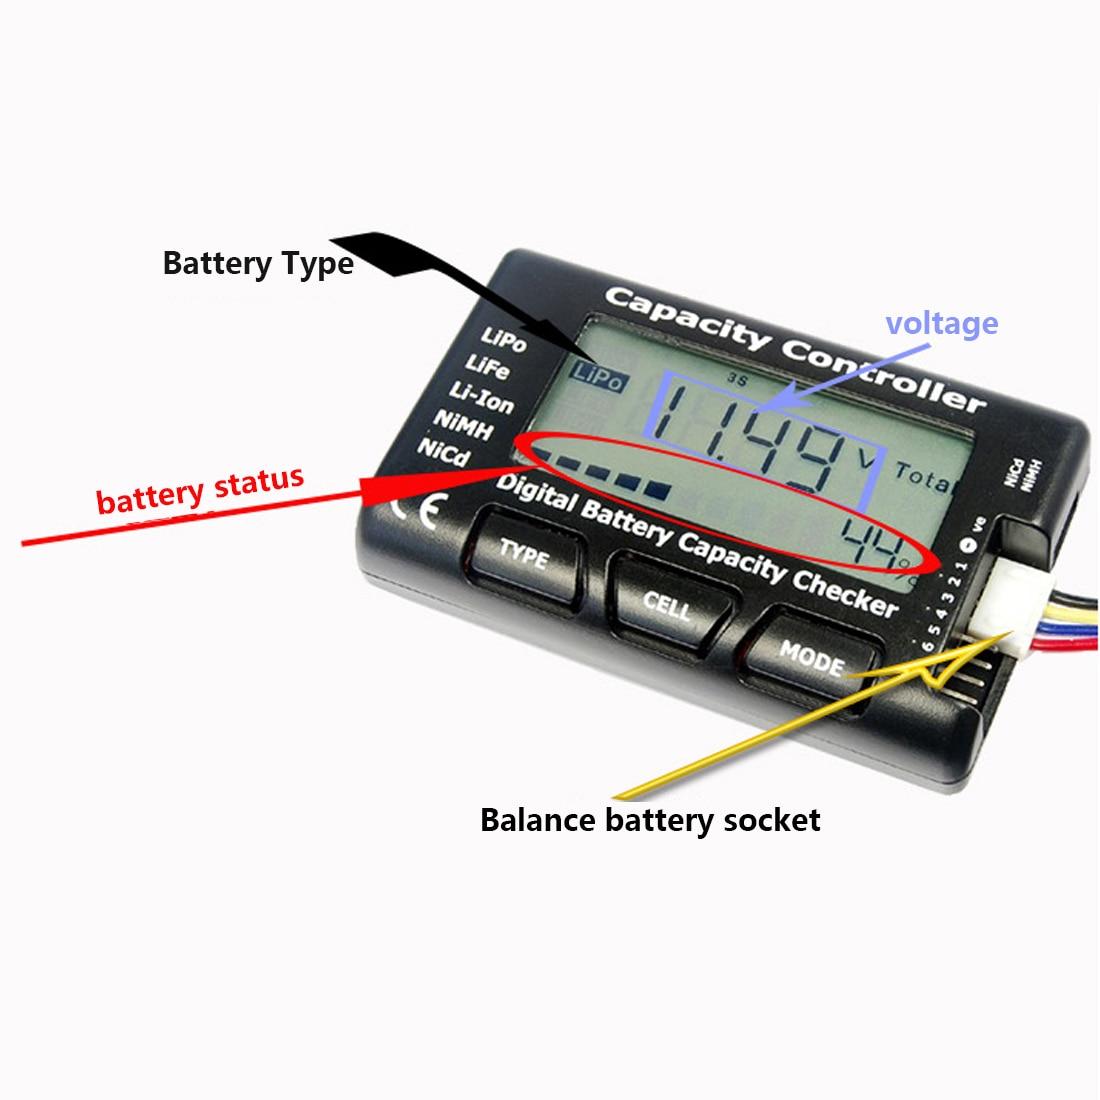 Iyi RC CellMeter-7 Dijital Pil Kapasitesi Checker LiPo LiFe Li-ion Nicd NiMH Pil voltmetre KontrolIyi RC CellMeter-7 Dijital Pil Kapasitesi Checker LiPo LiFe Li-ion Nicd NiMH Pil voltmetre Kontrol